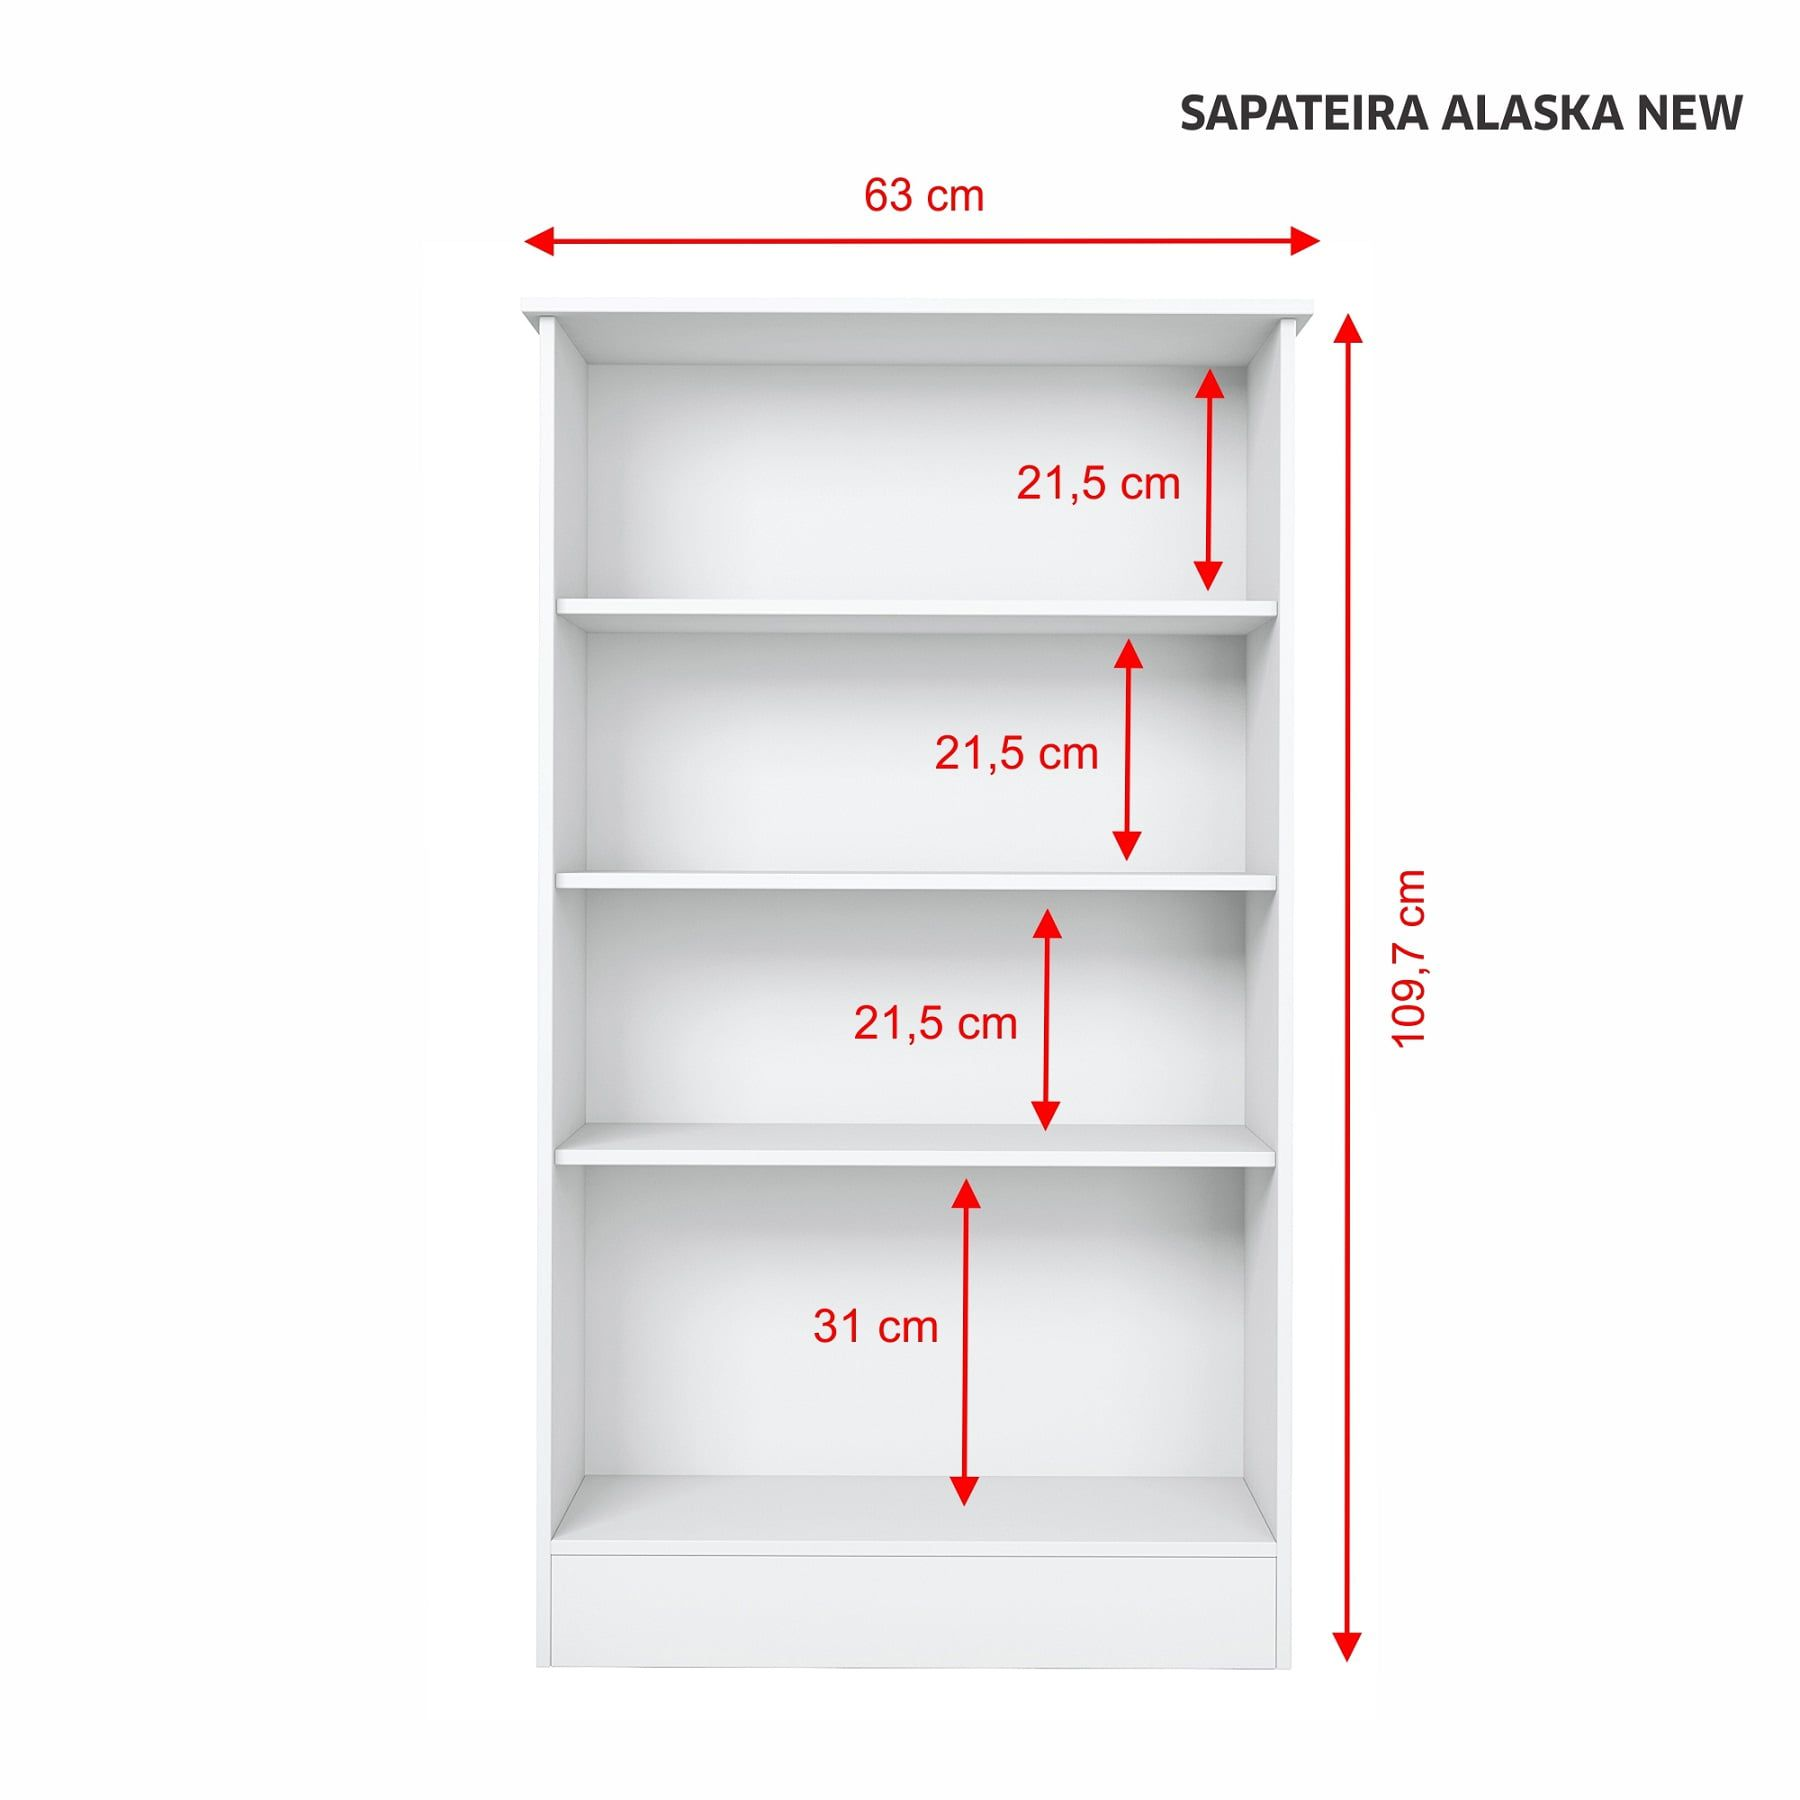 SAPATEIRA ALASKA NEW 2 PORTAS NOTÁVEL MÓVEIS